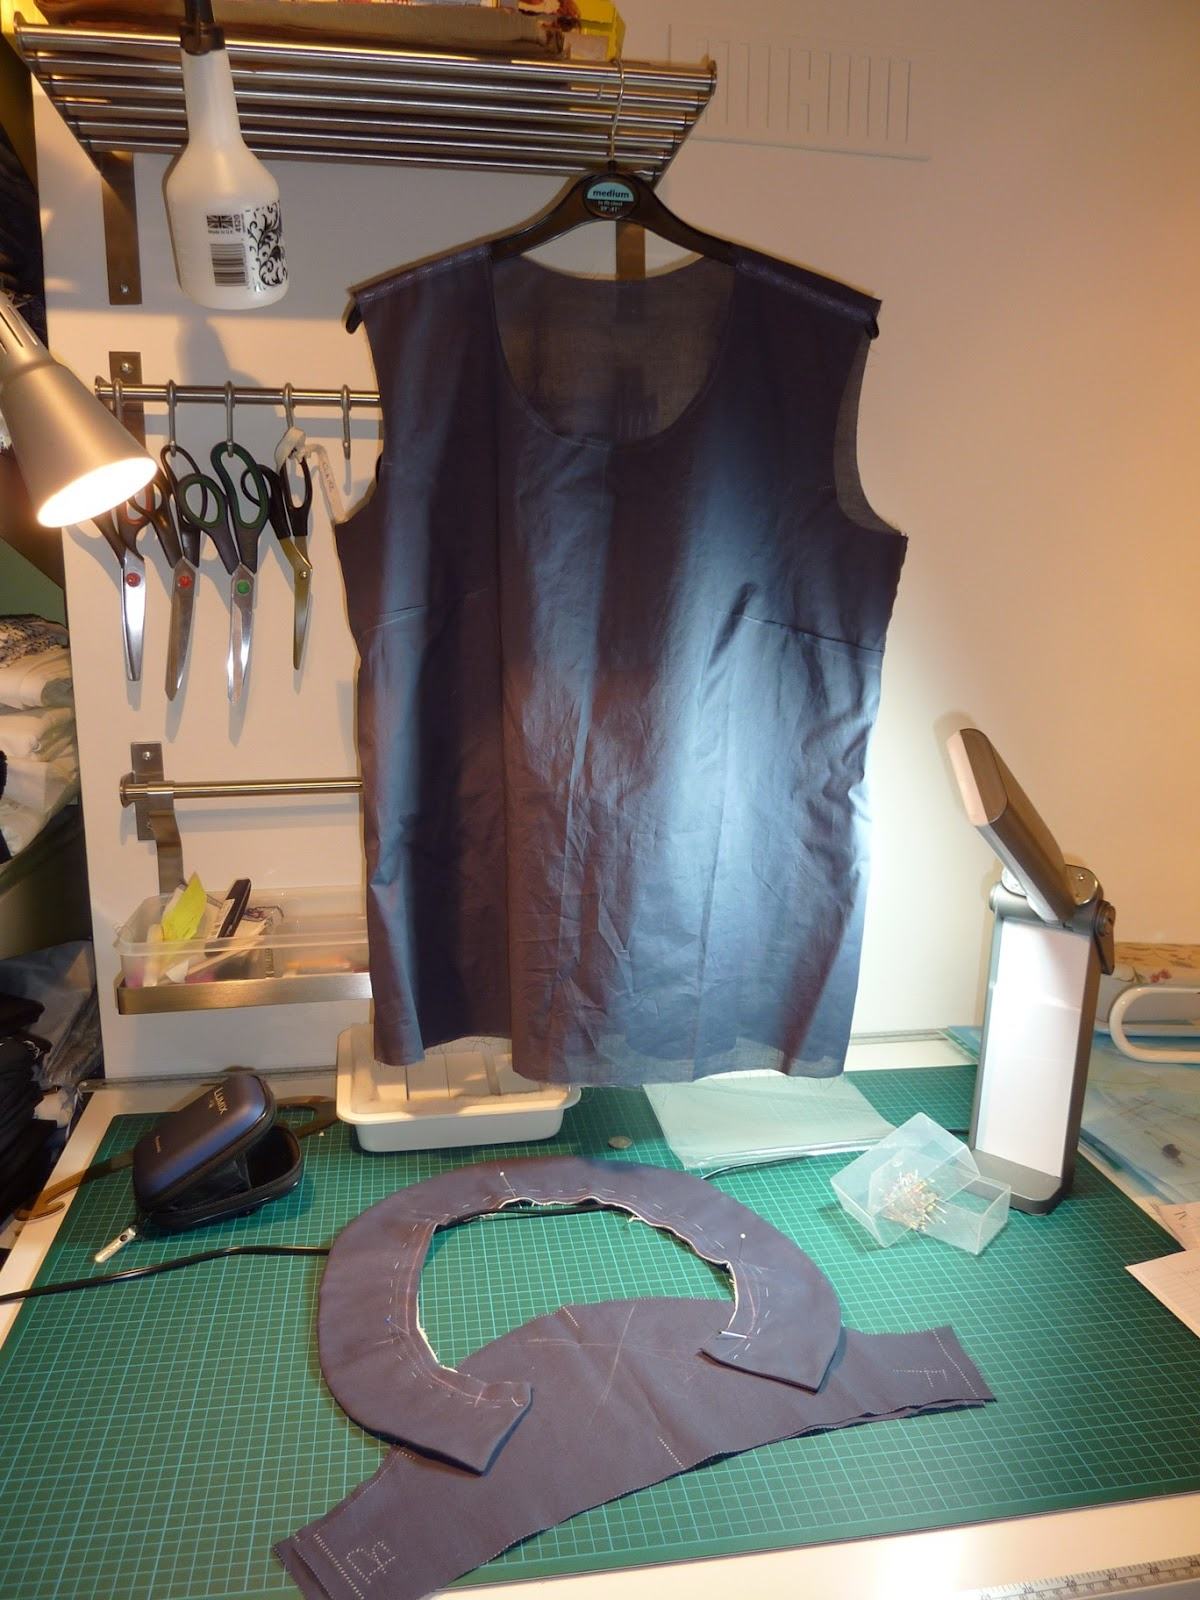 http://4.bp.blogspot.com/-3TuDglQwJxk/TyxpPd6fEoI/AAAAAAAAAKs/Nwy9DxQps_s/s1600/Nearly+finished+Scout+Woven+T-Shirt.jpg